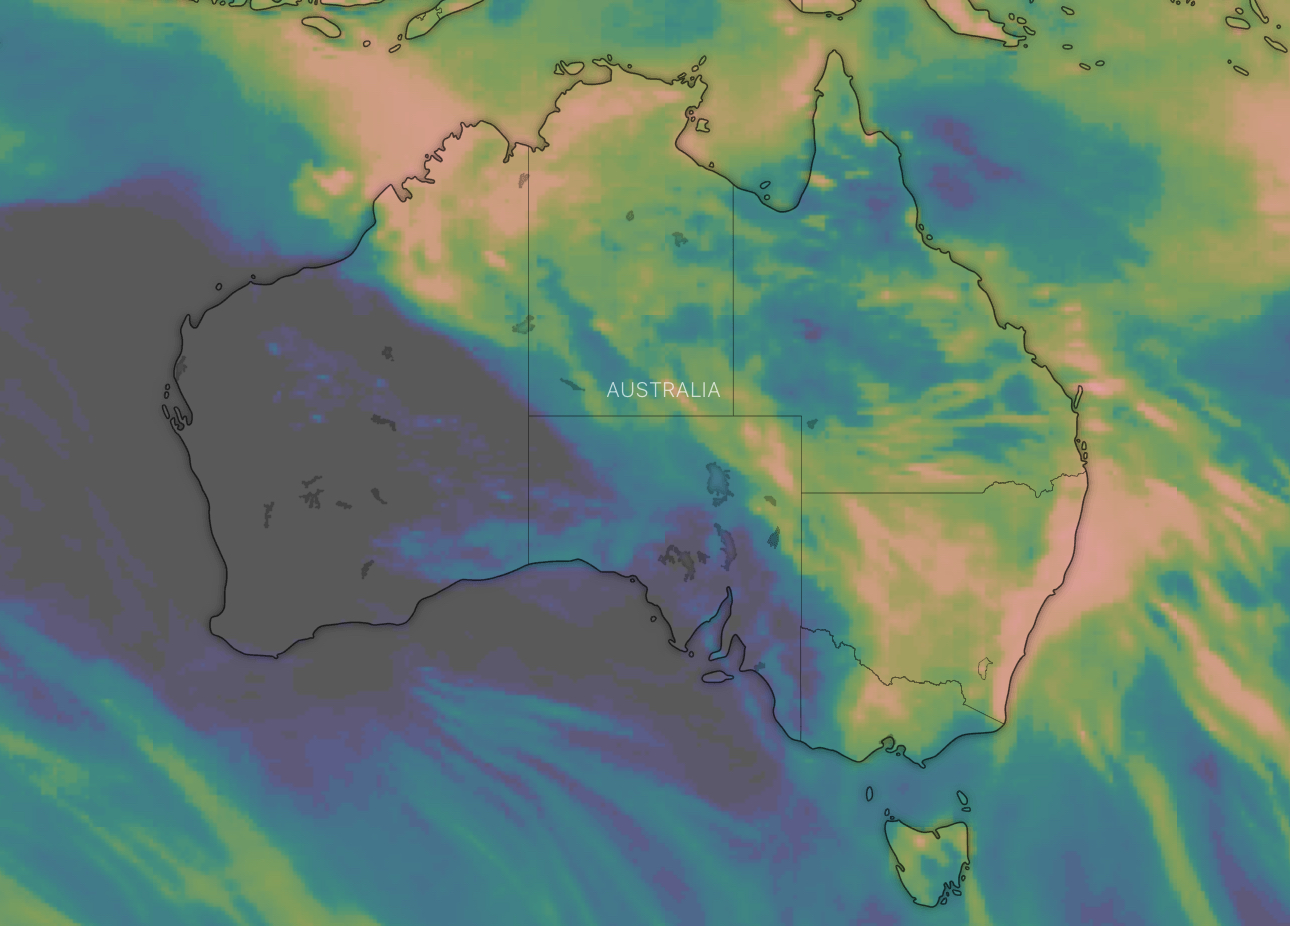 rain event - Windy 10 day rainfall